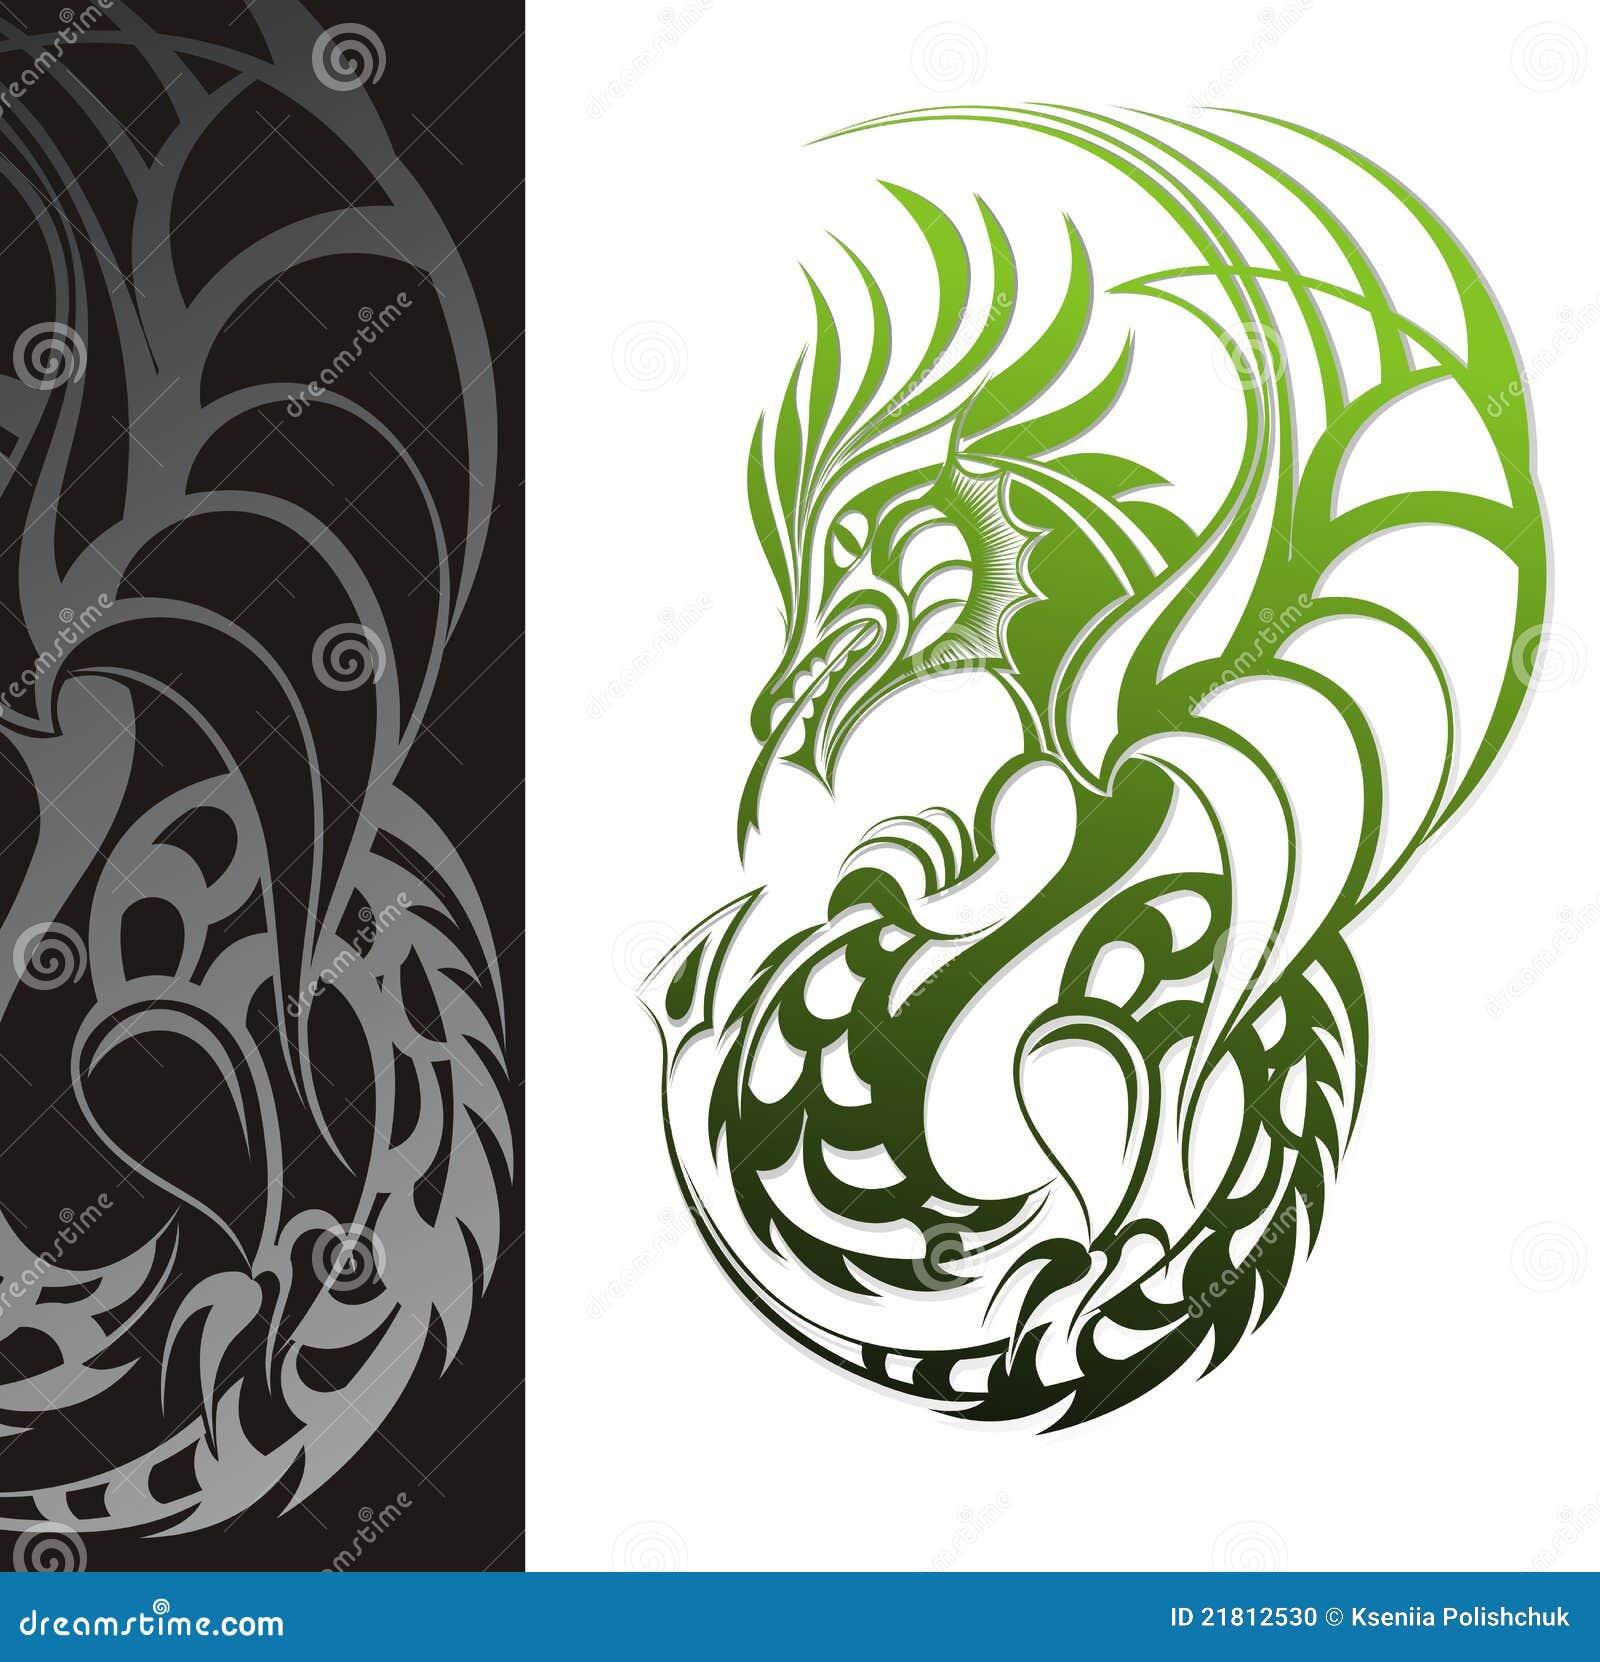 Dragon. Tattoo Design Stock Photo - Image: 21812530